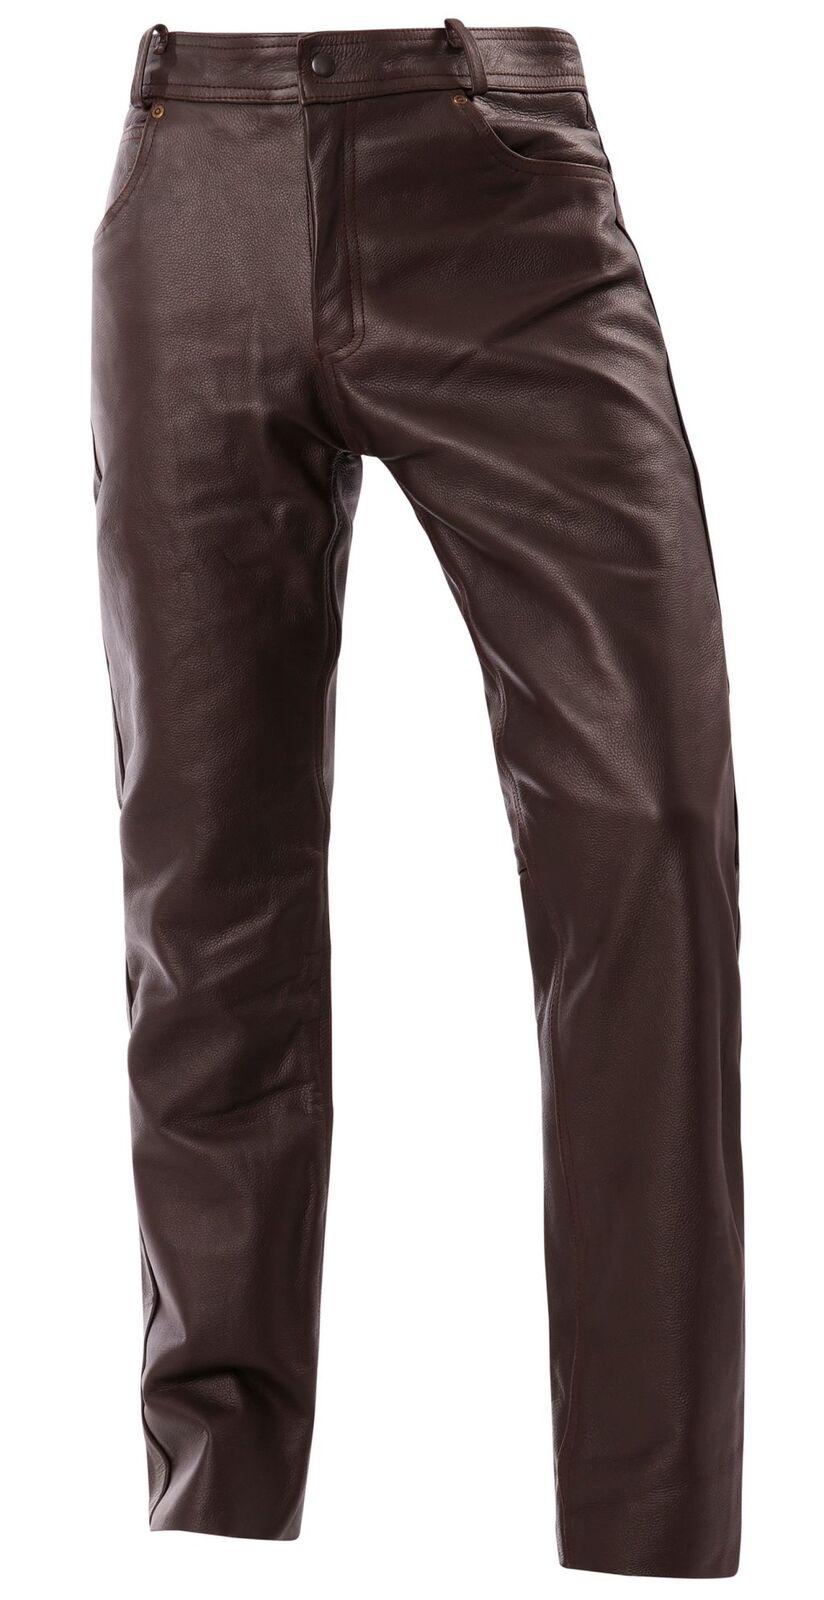 Bangla Herren Bekleidung Motorrad Lederhose 1507 Braun 29-34